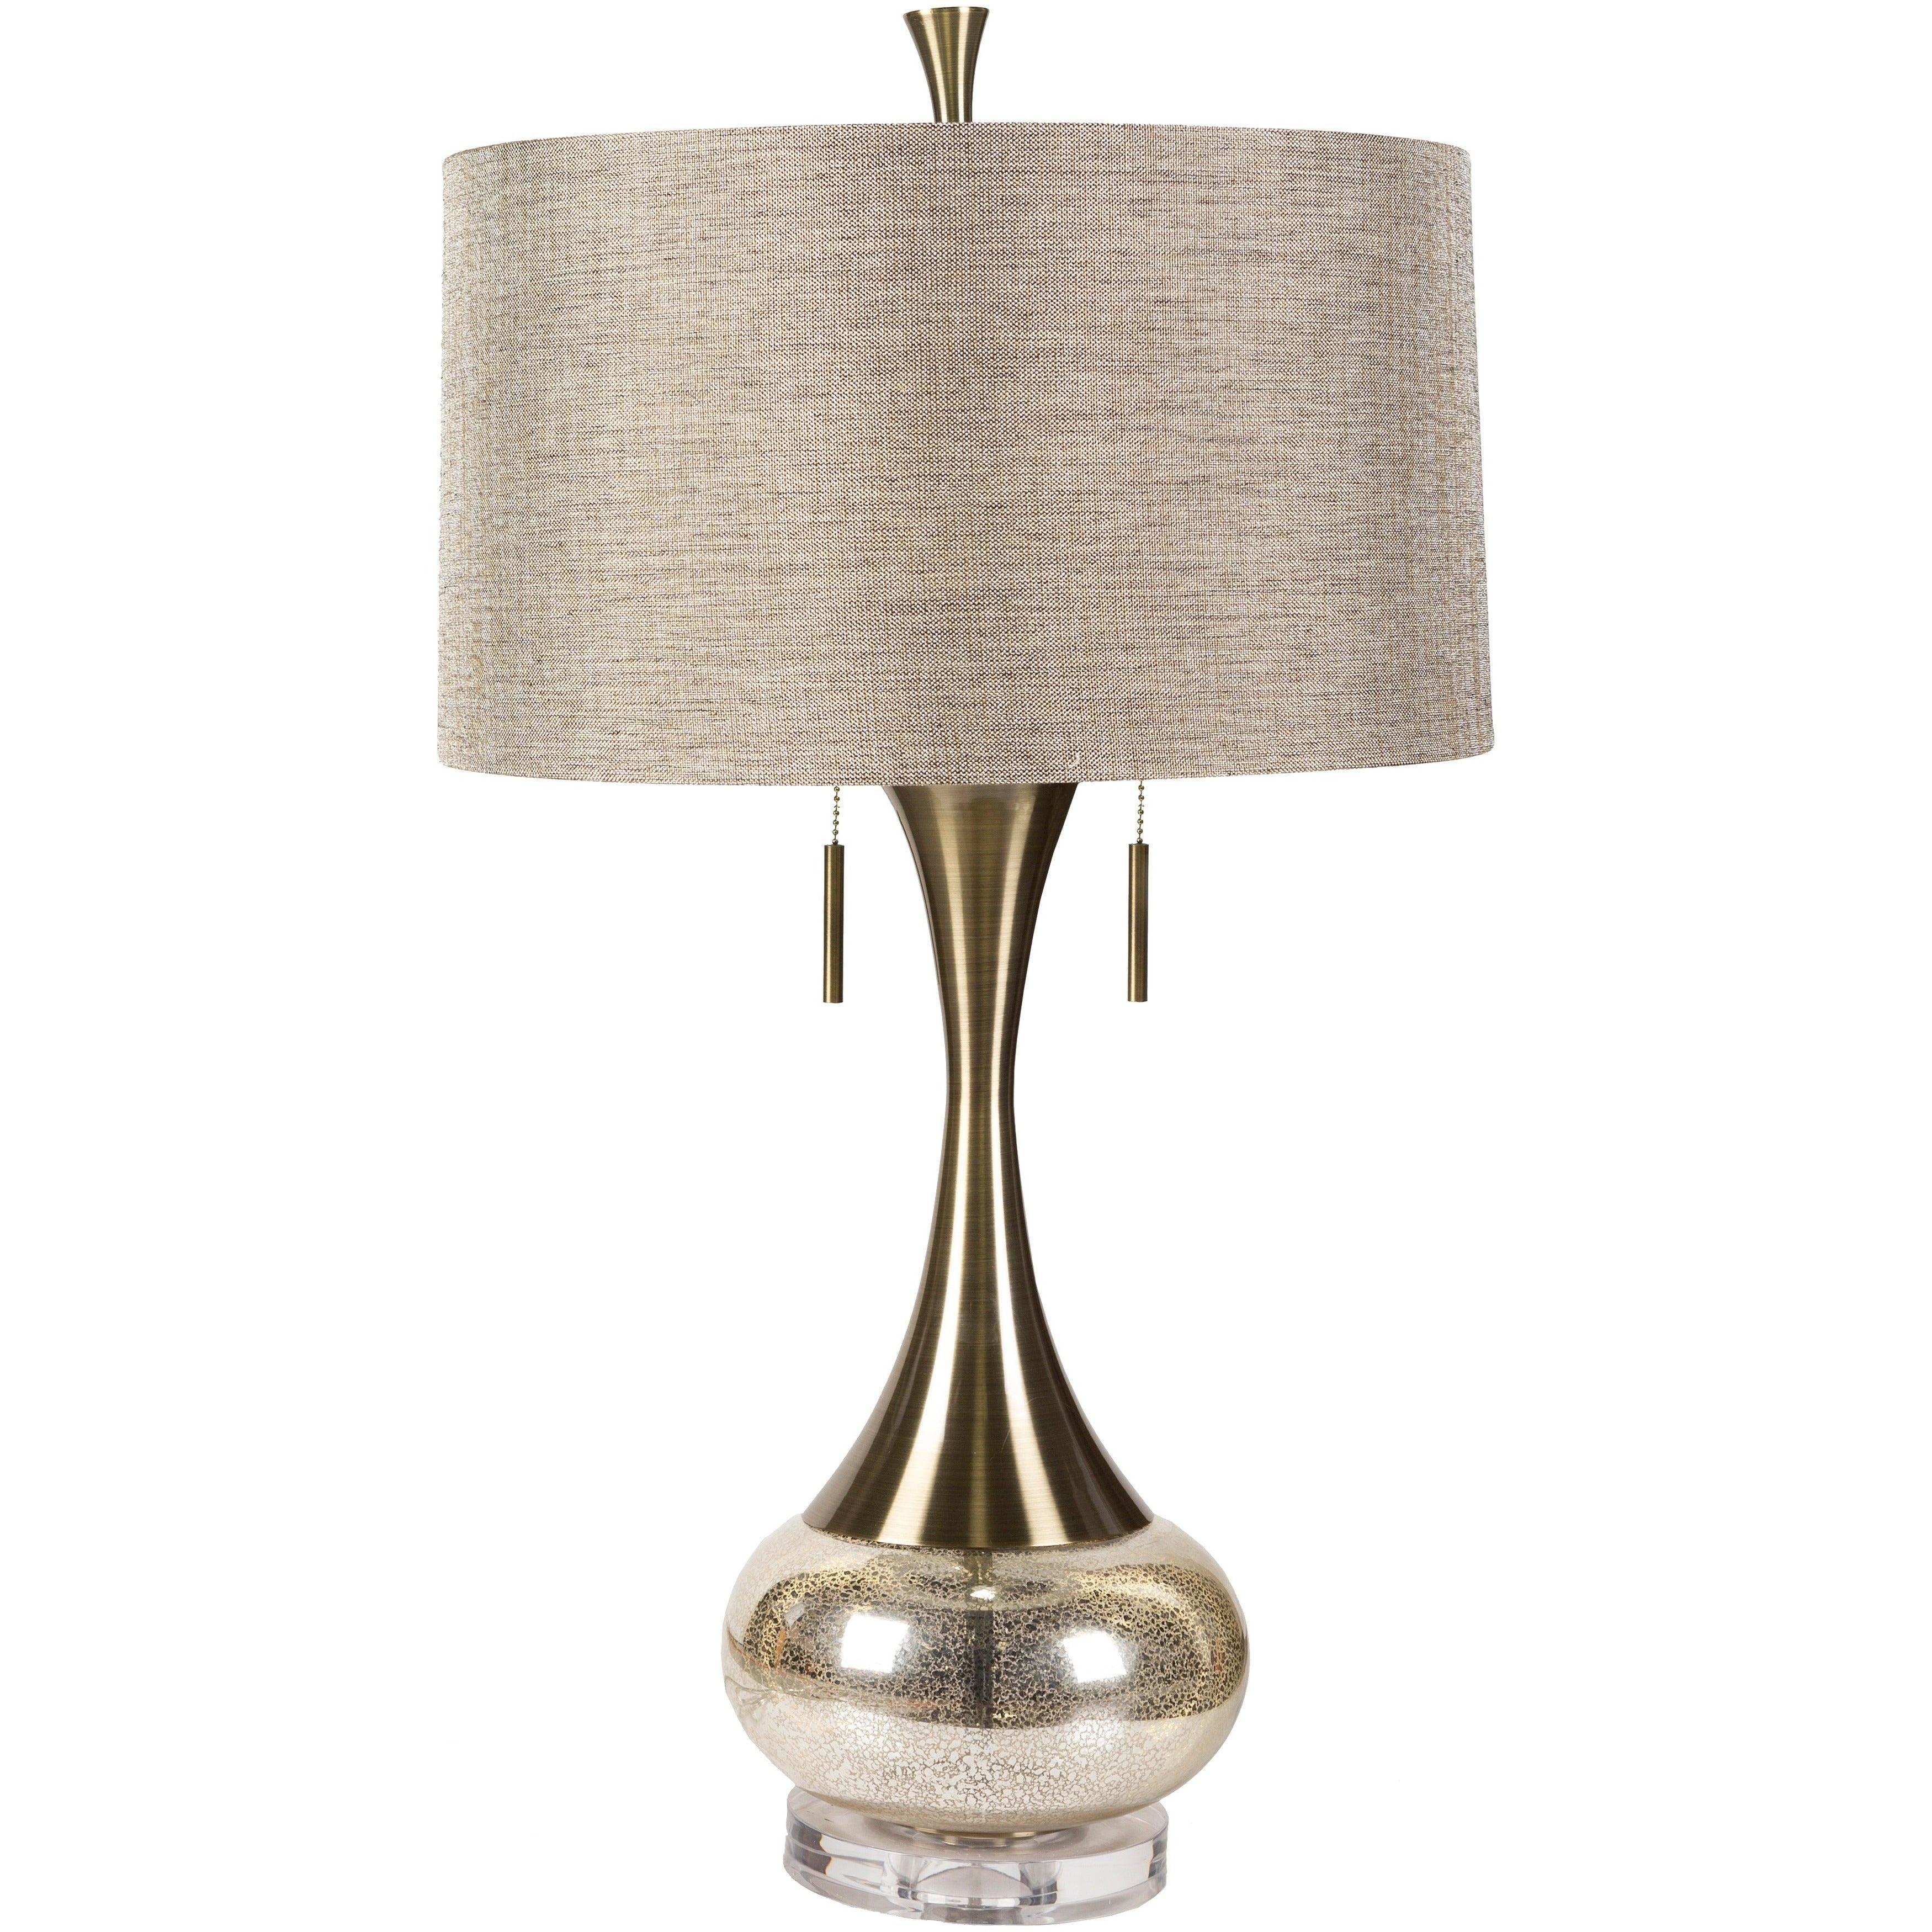 SURYA Deep Gold Lust Table Lamp (Glowing), Beige (Brass)